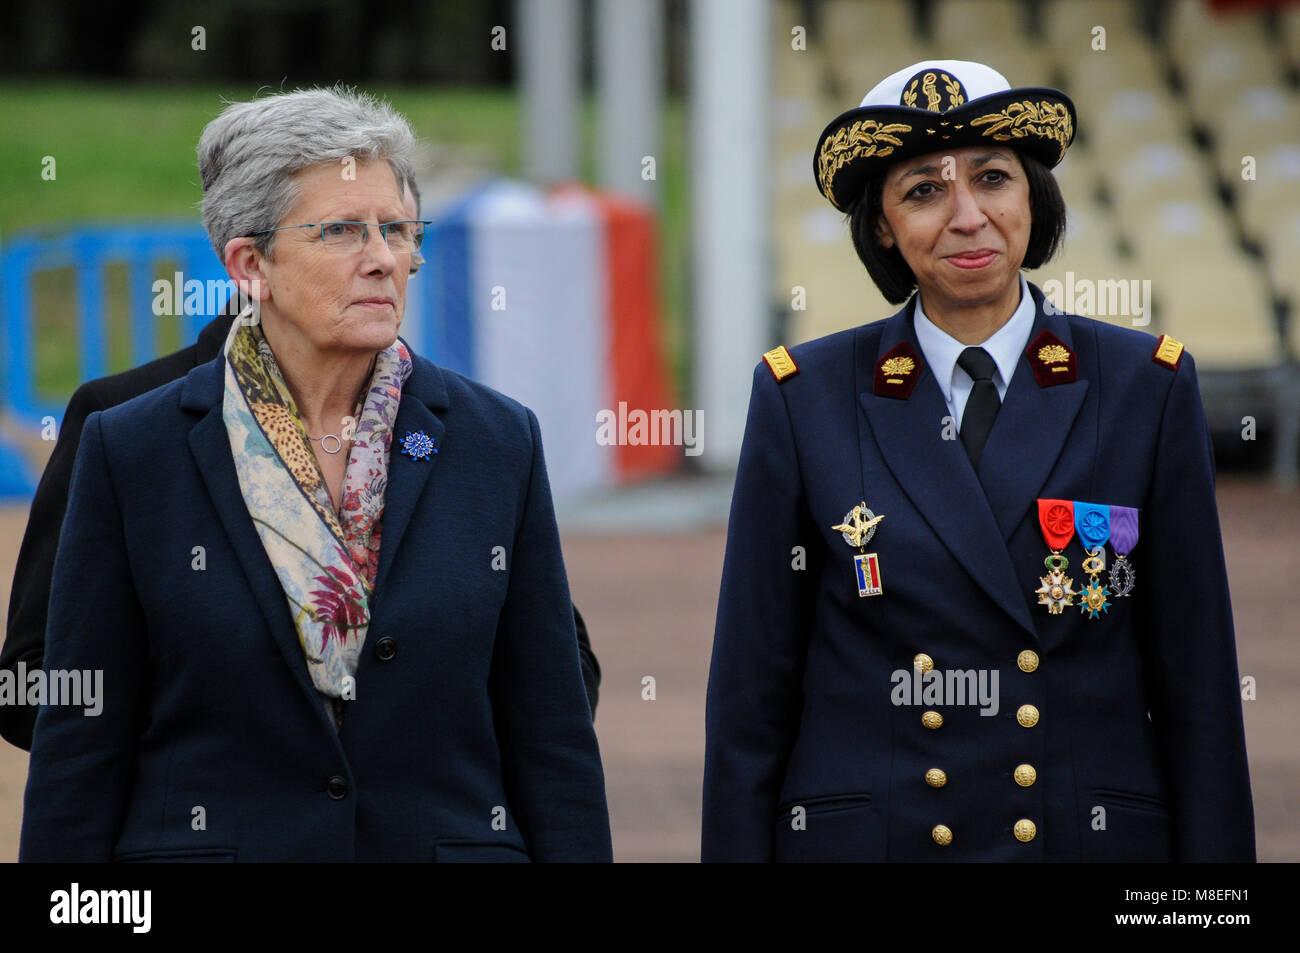 bron-france-16-mars-2018-genevieve-darri